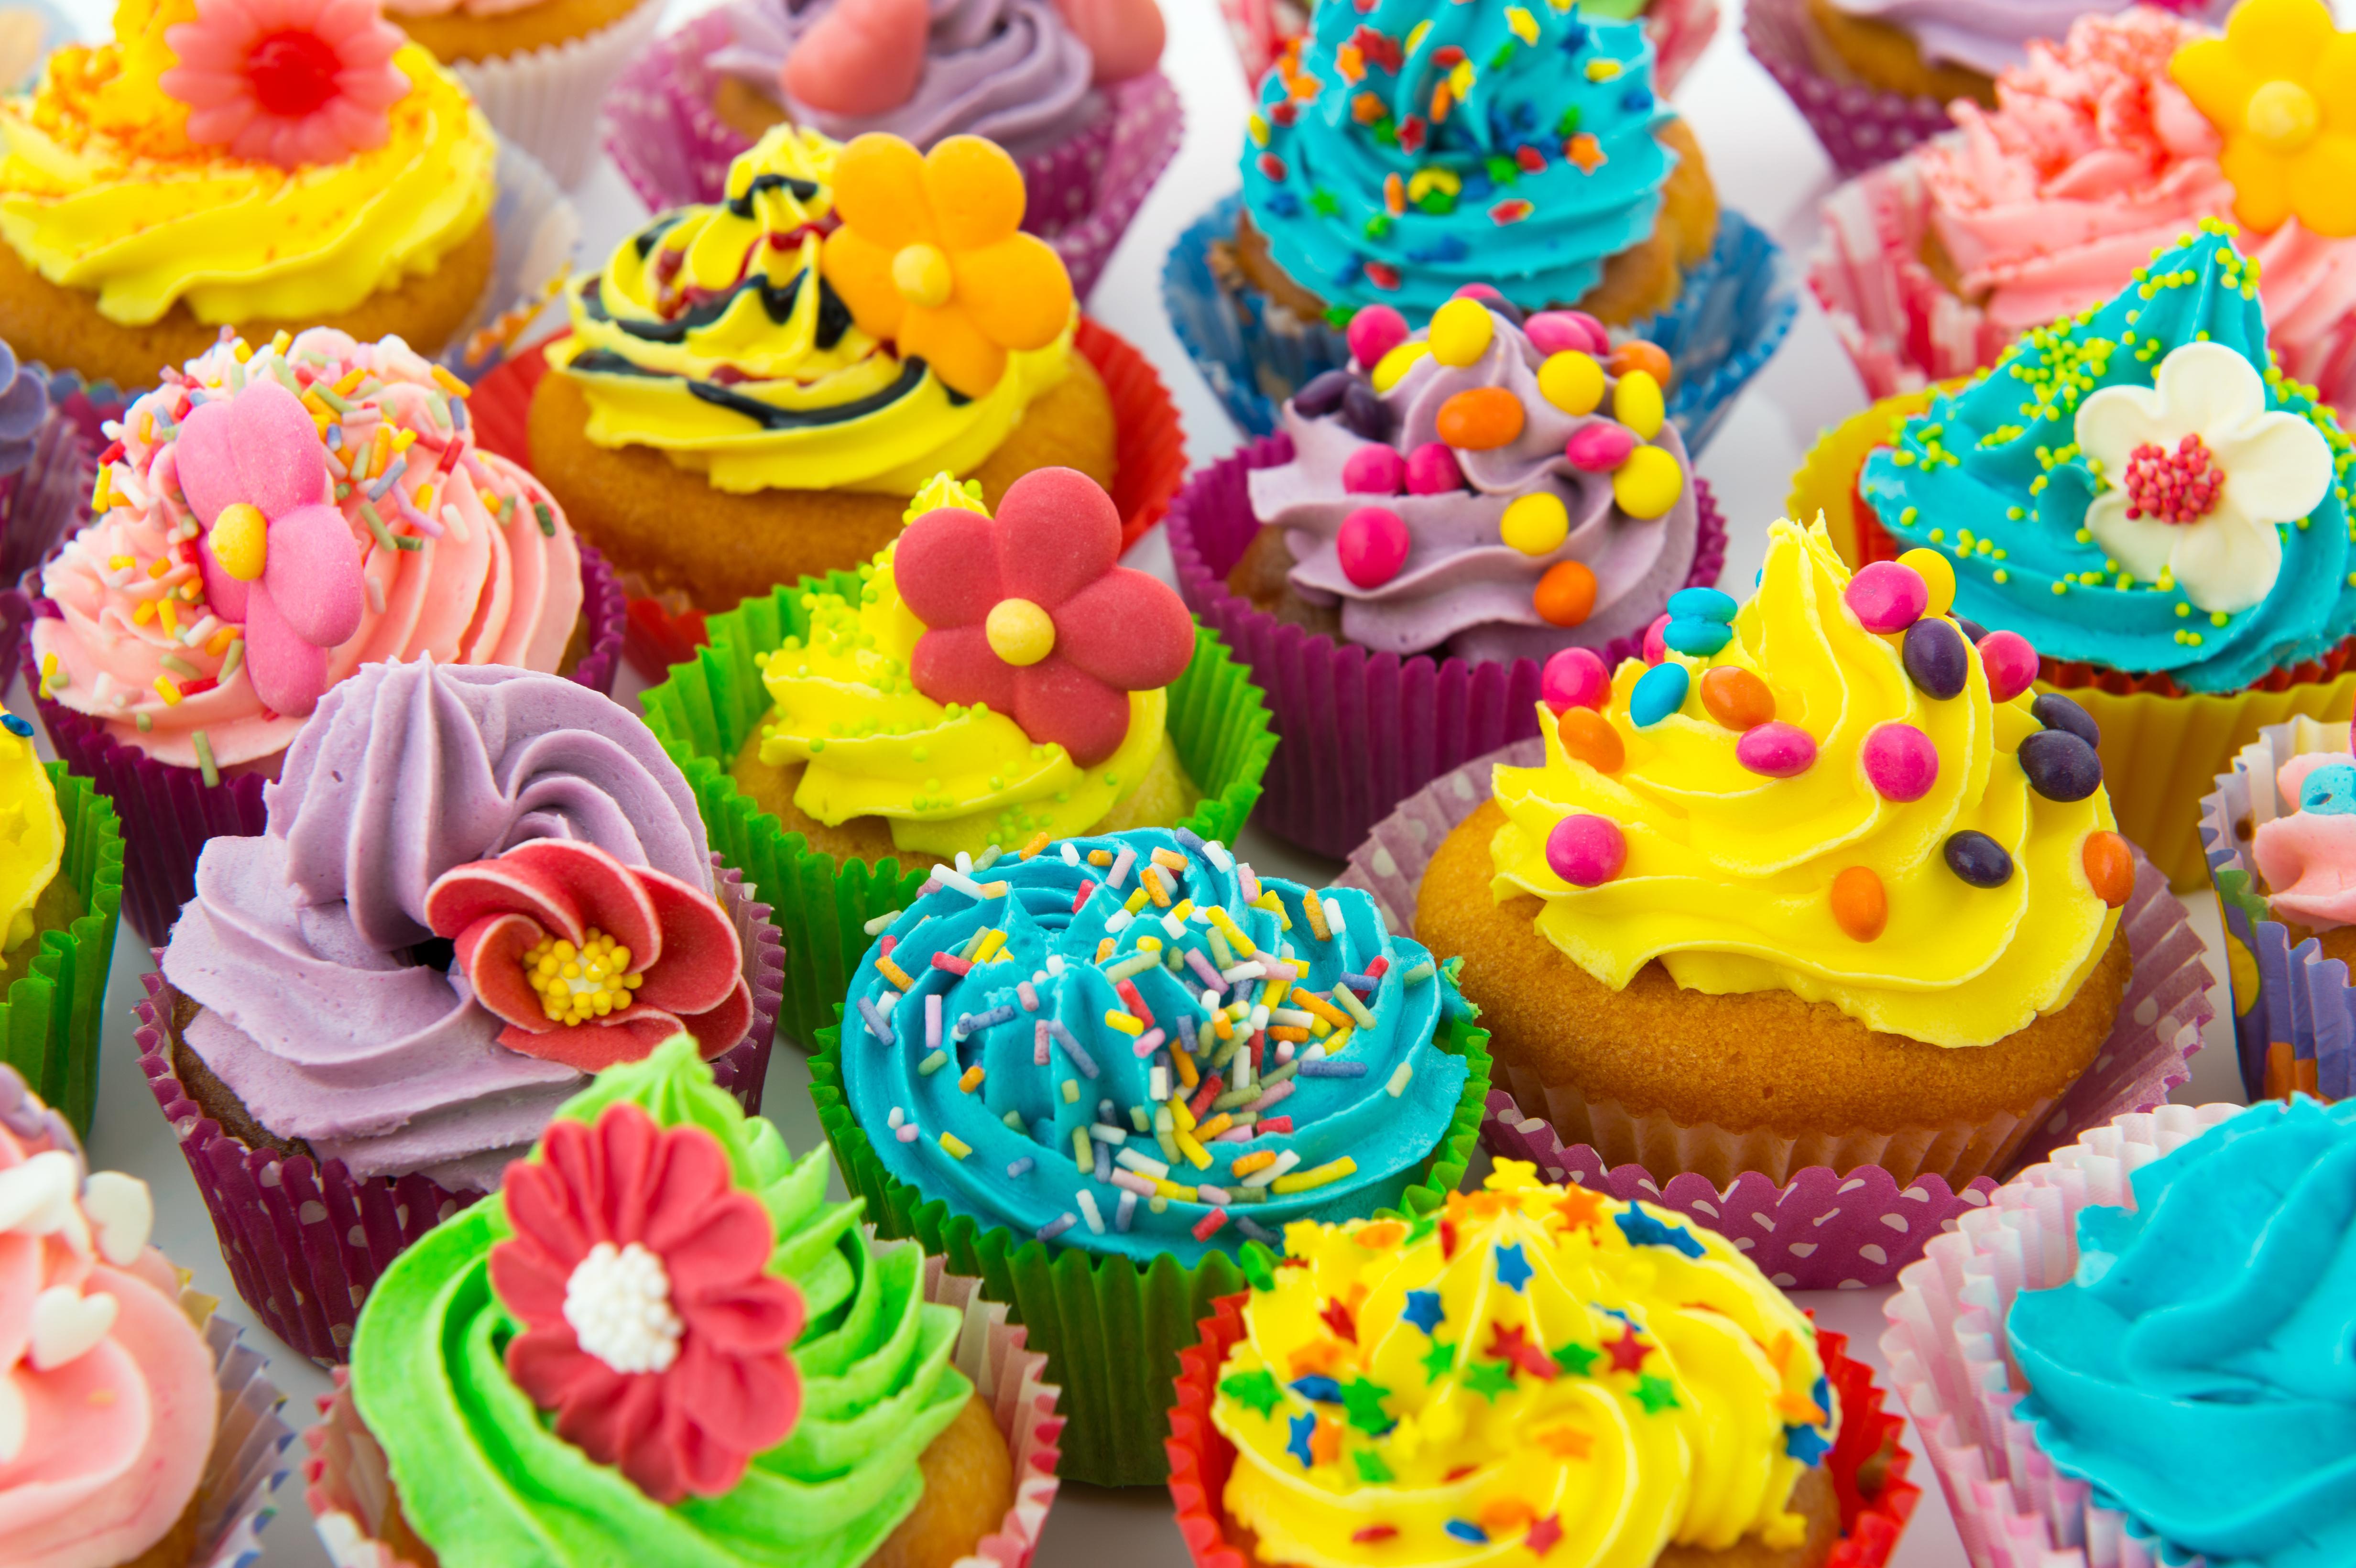 Colorful Food Wallpaper Free Download: Colorful Cupcakes 4k Ultra HD Wallpaper